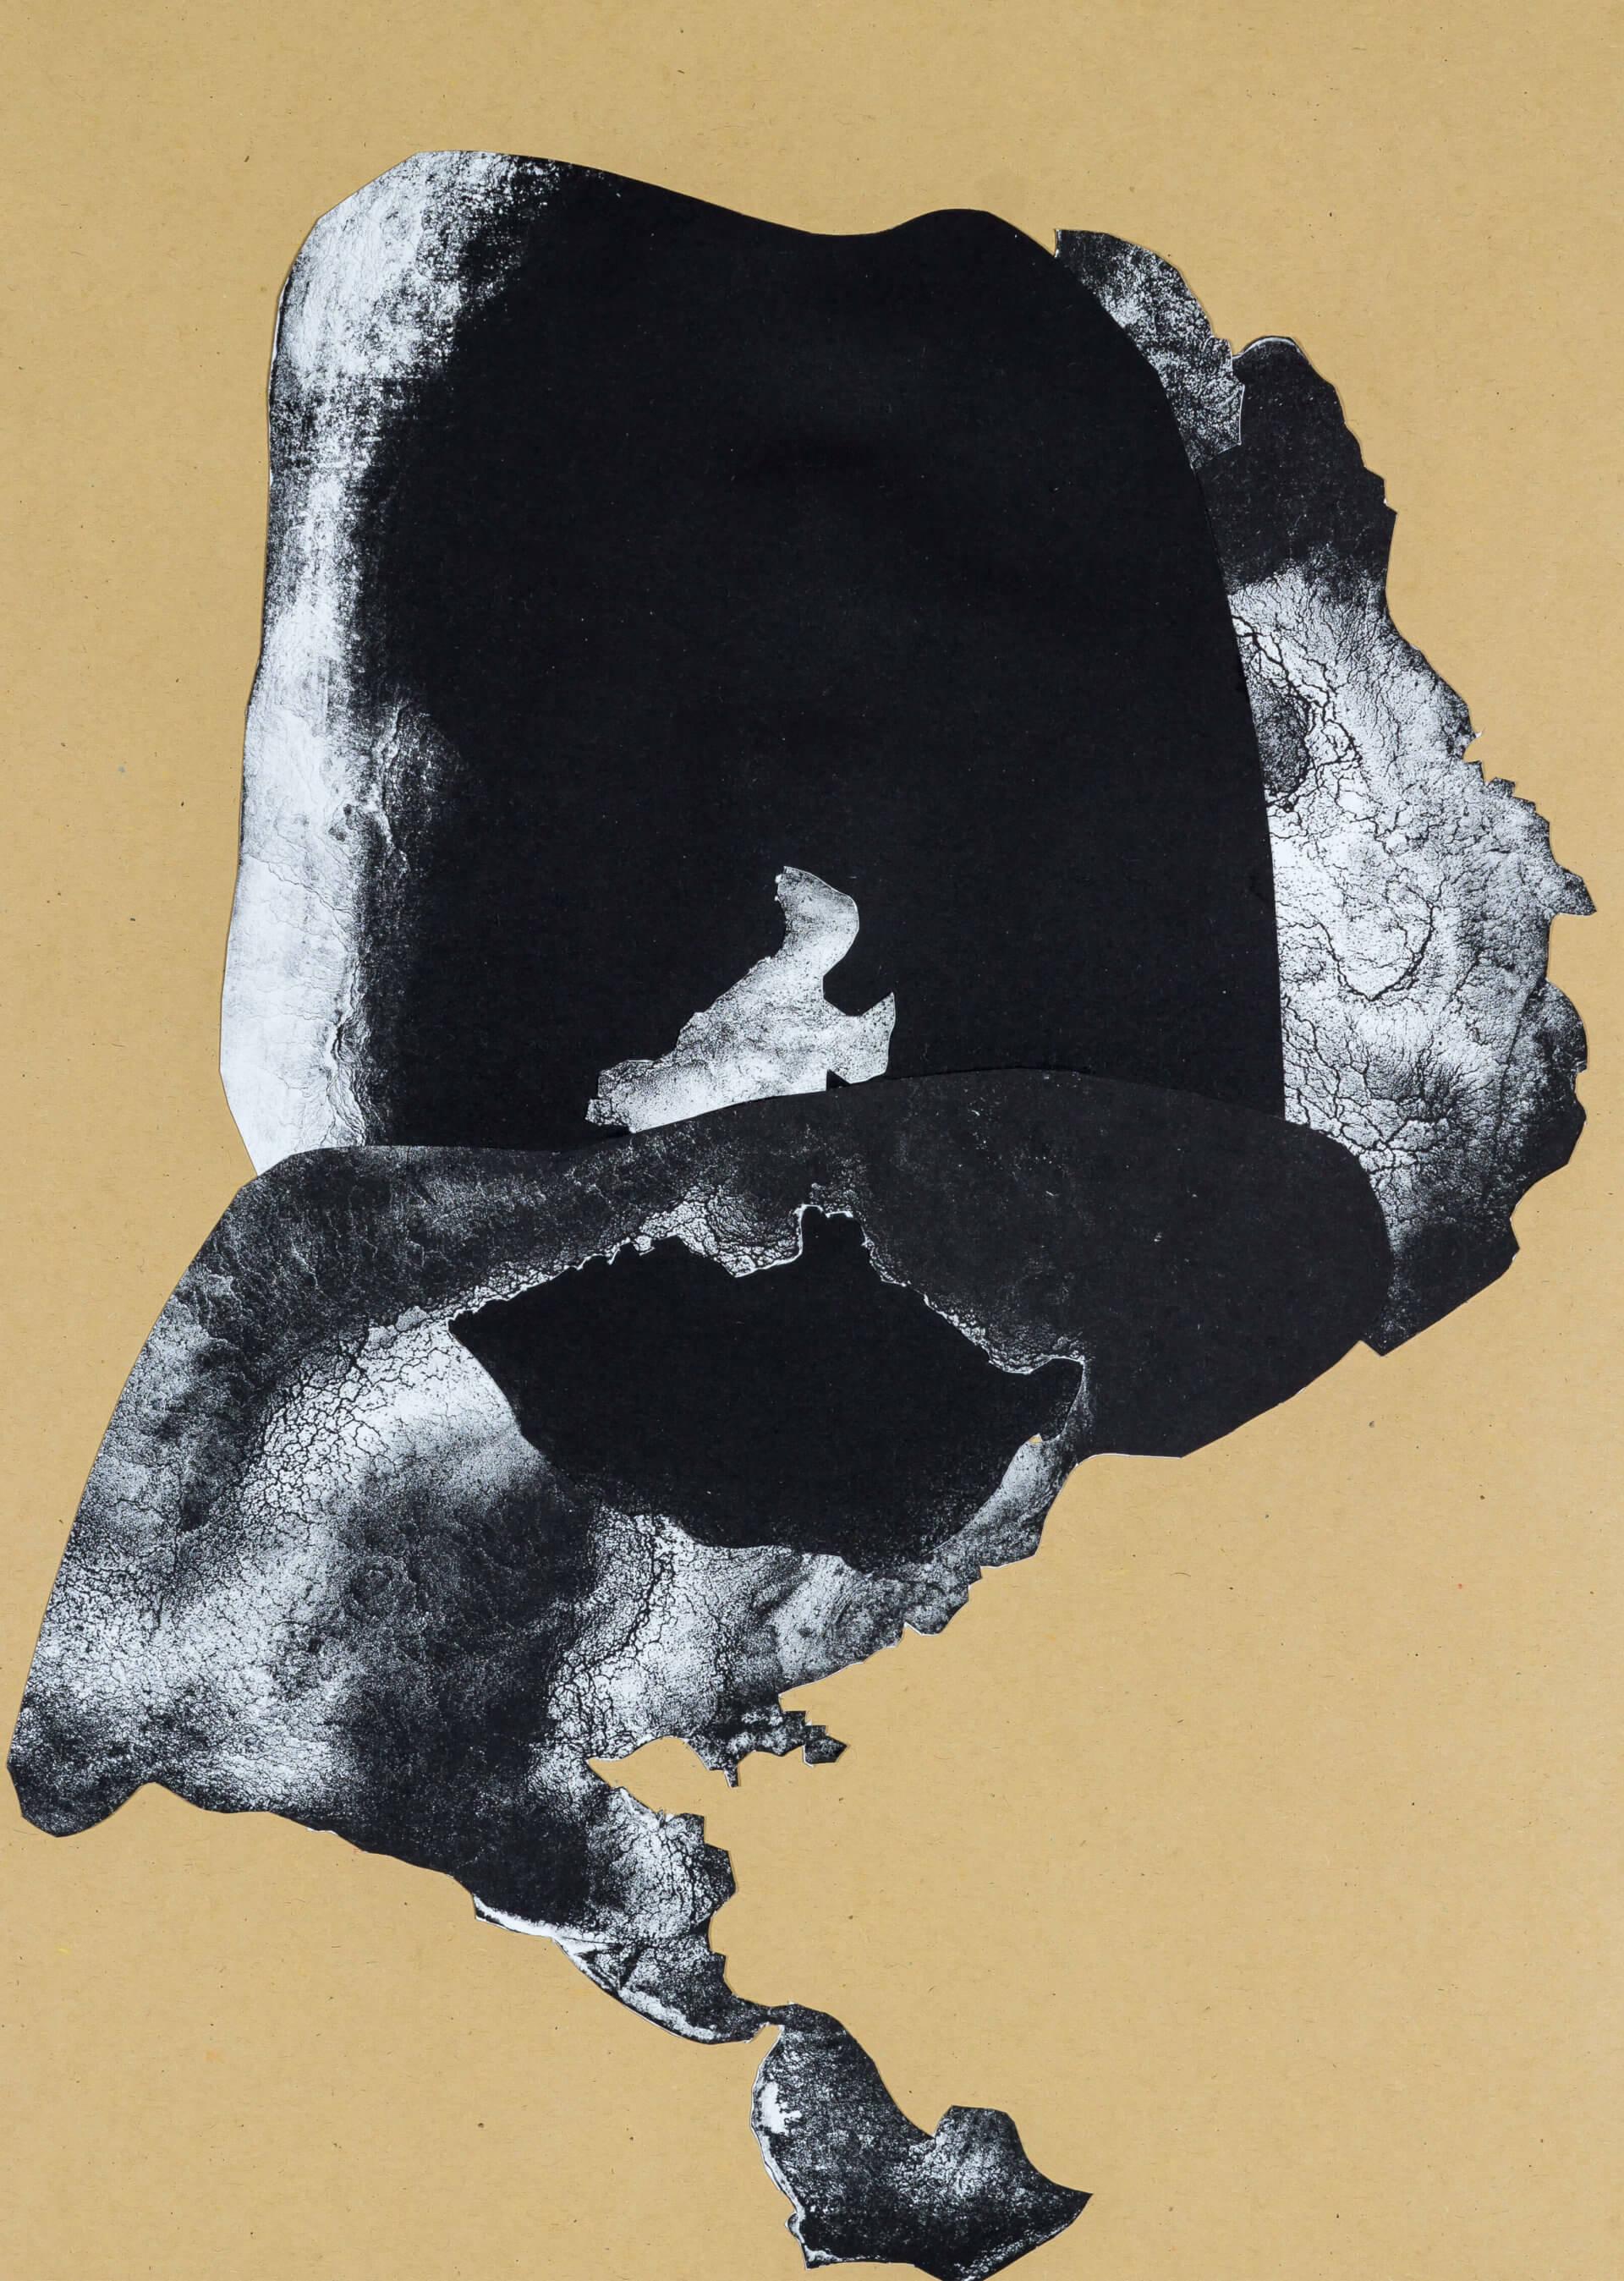 organism (cr) II, 2018, Lithographiecollage auf Papier, Unikat, 41,5x30cm